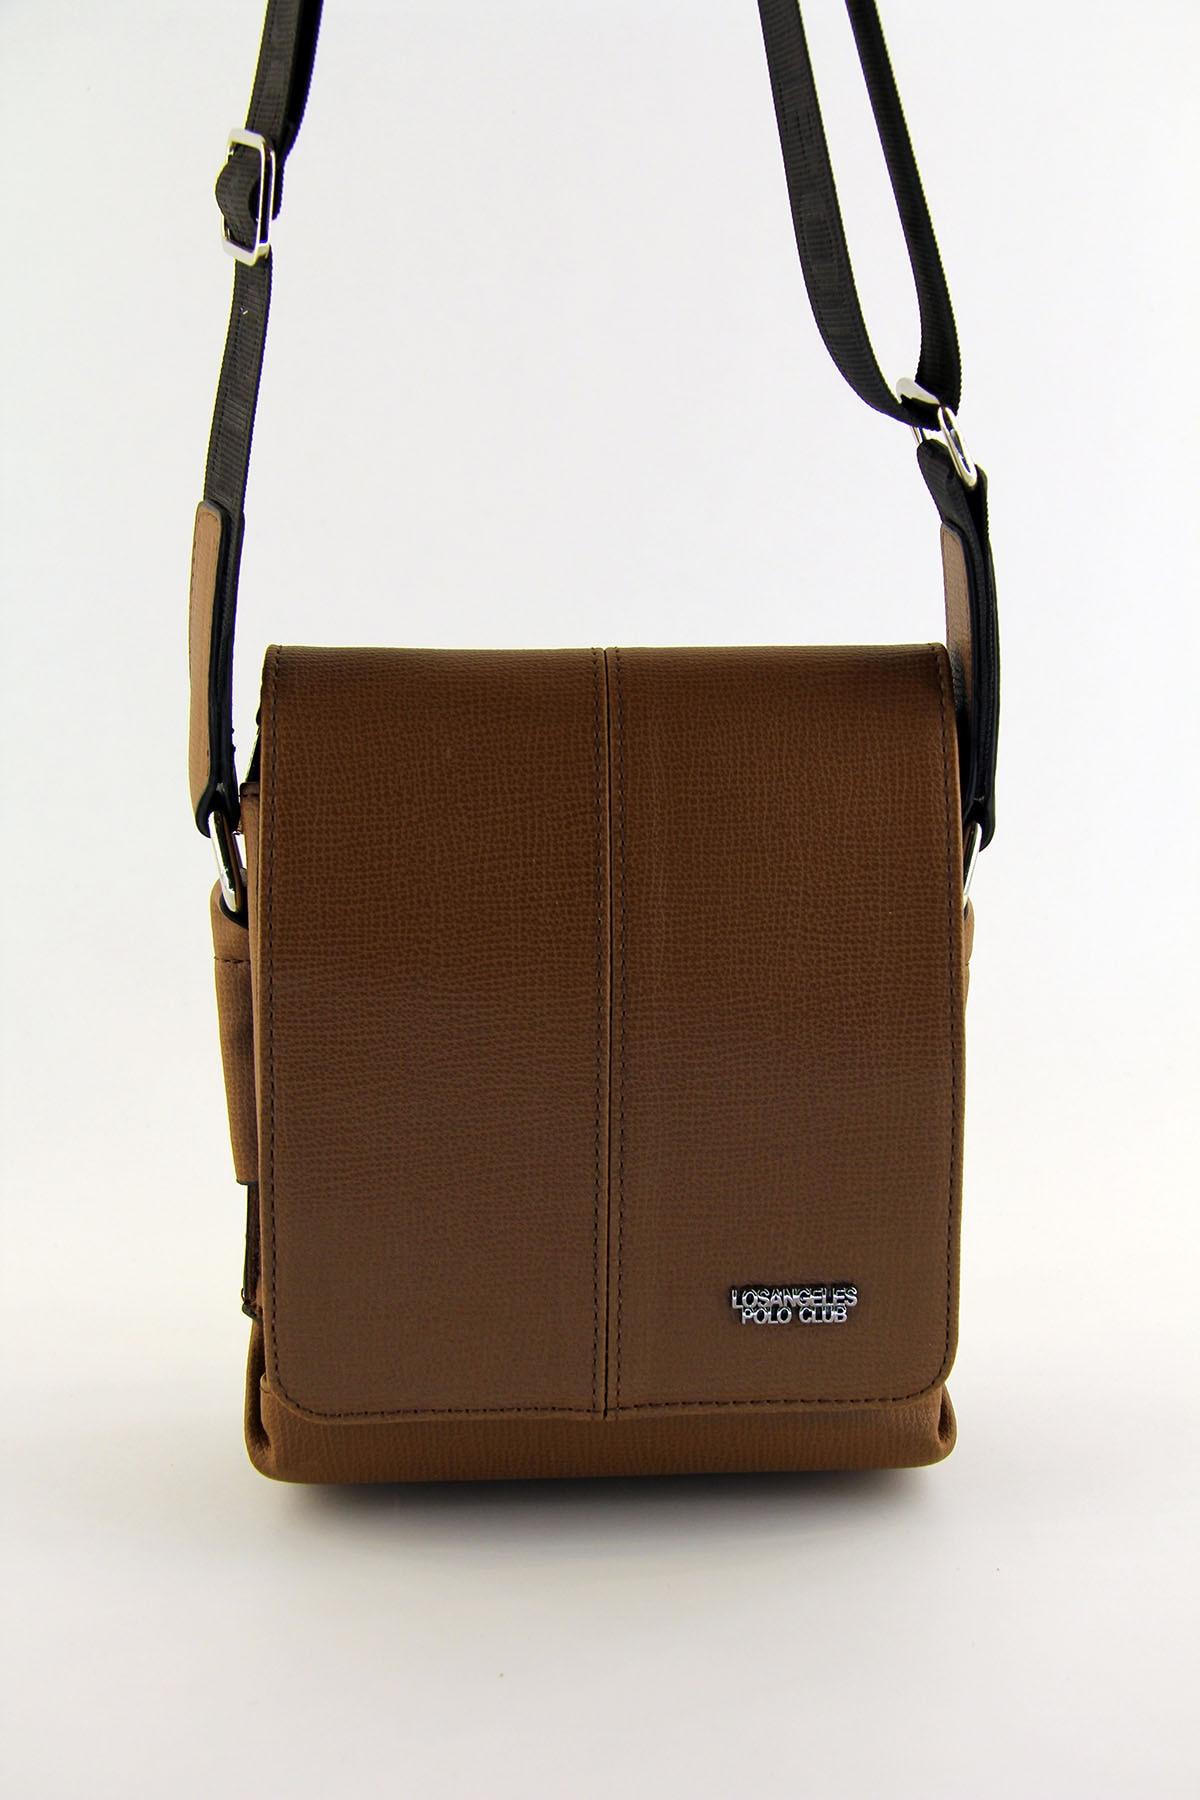 POLO 8031 SMALL MALE POSTMAN SHOULDER BAG CROSSBODY BAG